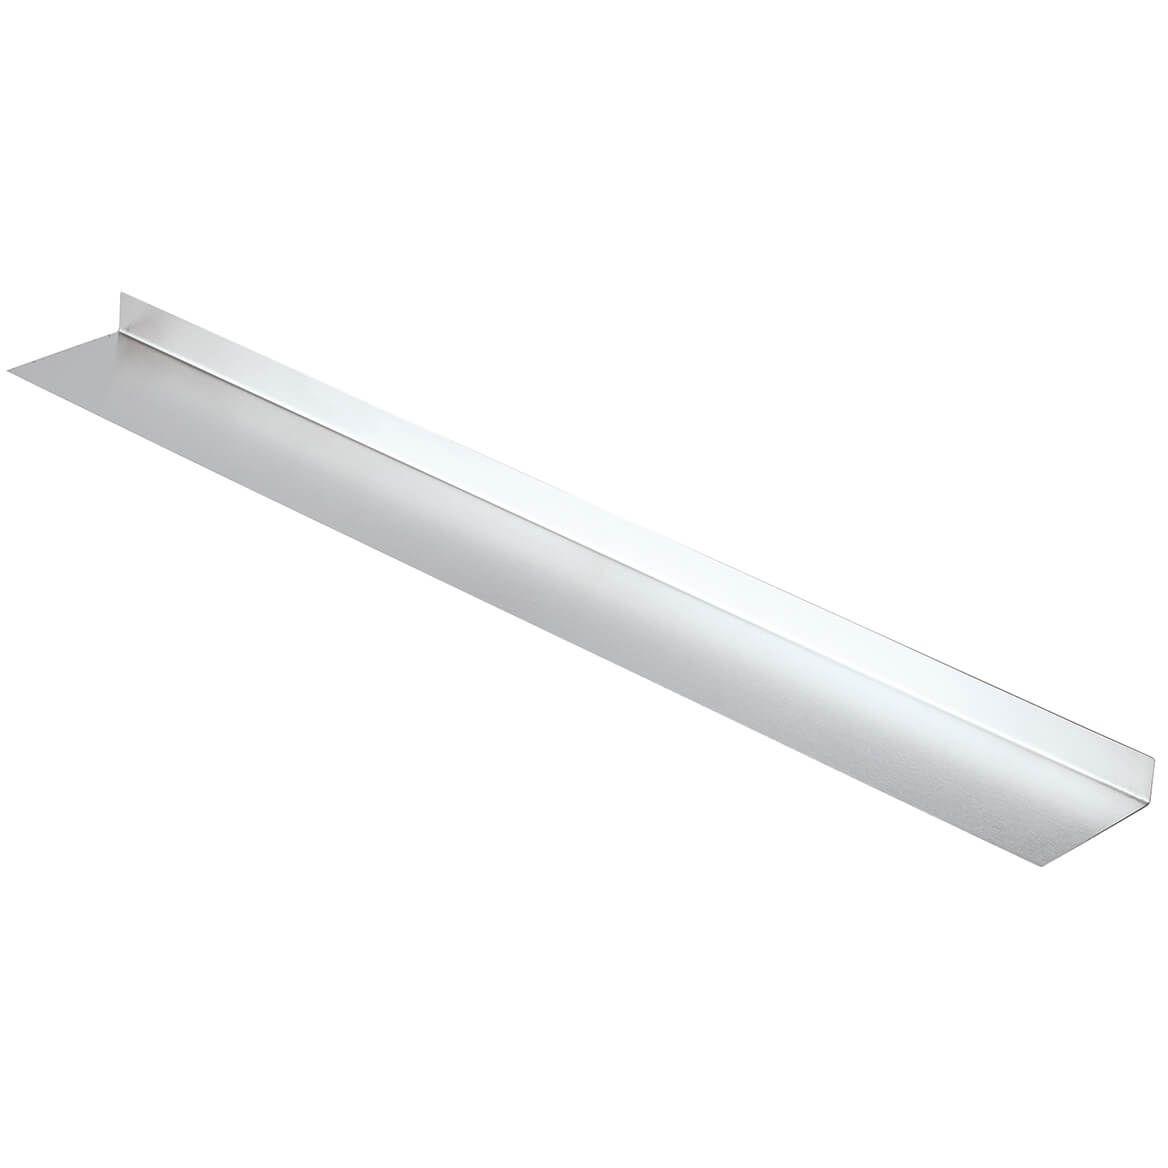 Stainless Steel Instant Range Top Shelf-370899